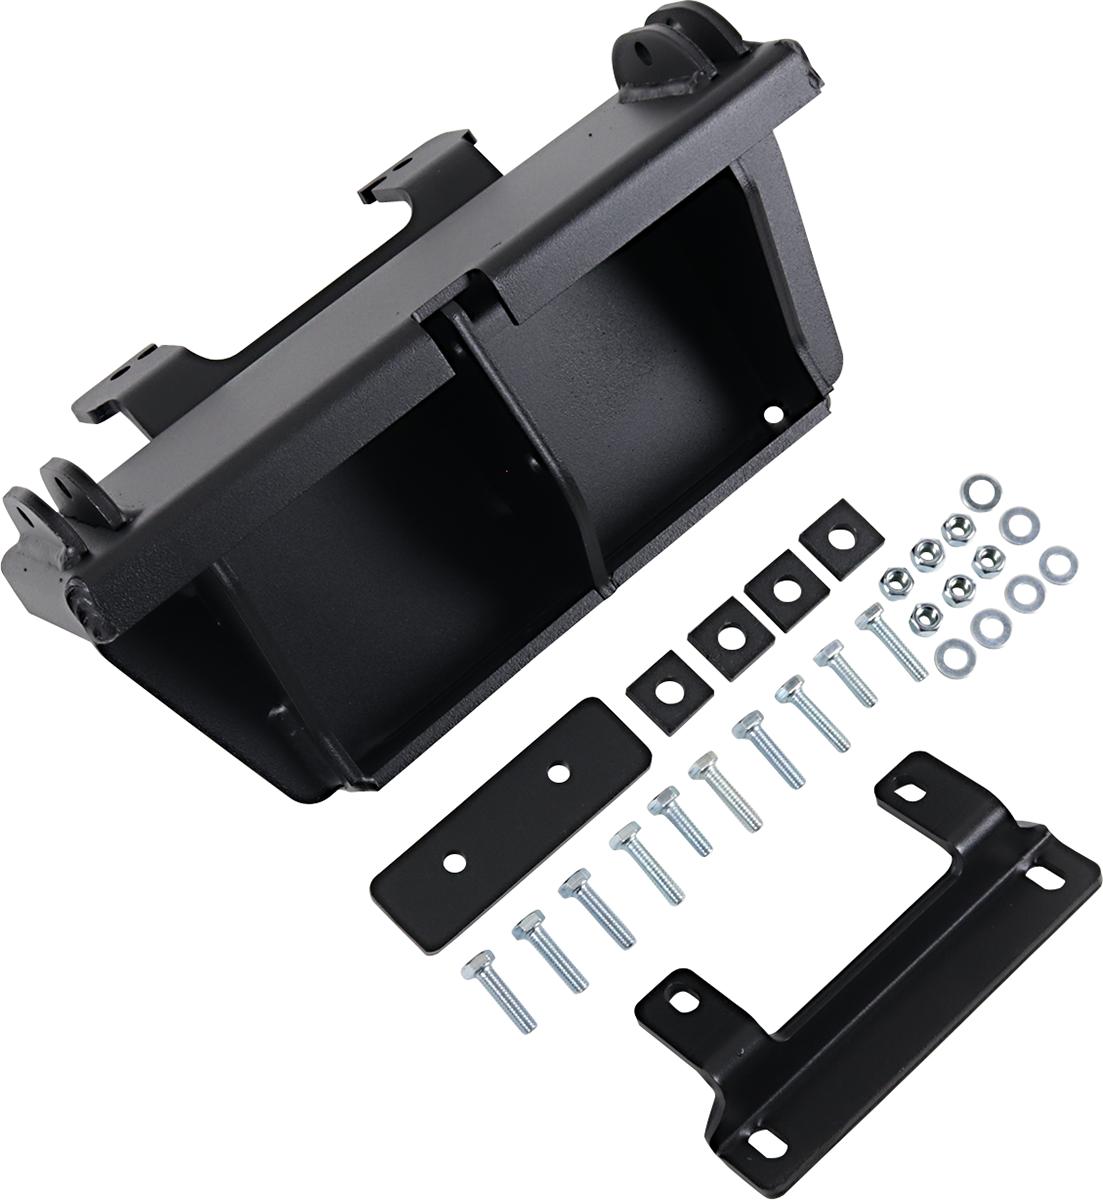 Moose Utility RM5 Black UTV Plow Mounting Plate 2019 Yamaha Wolverine 850 X2